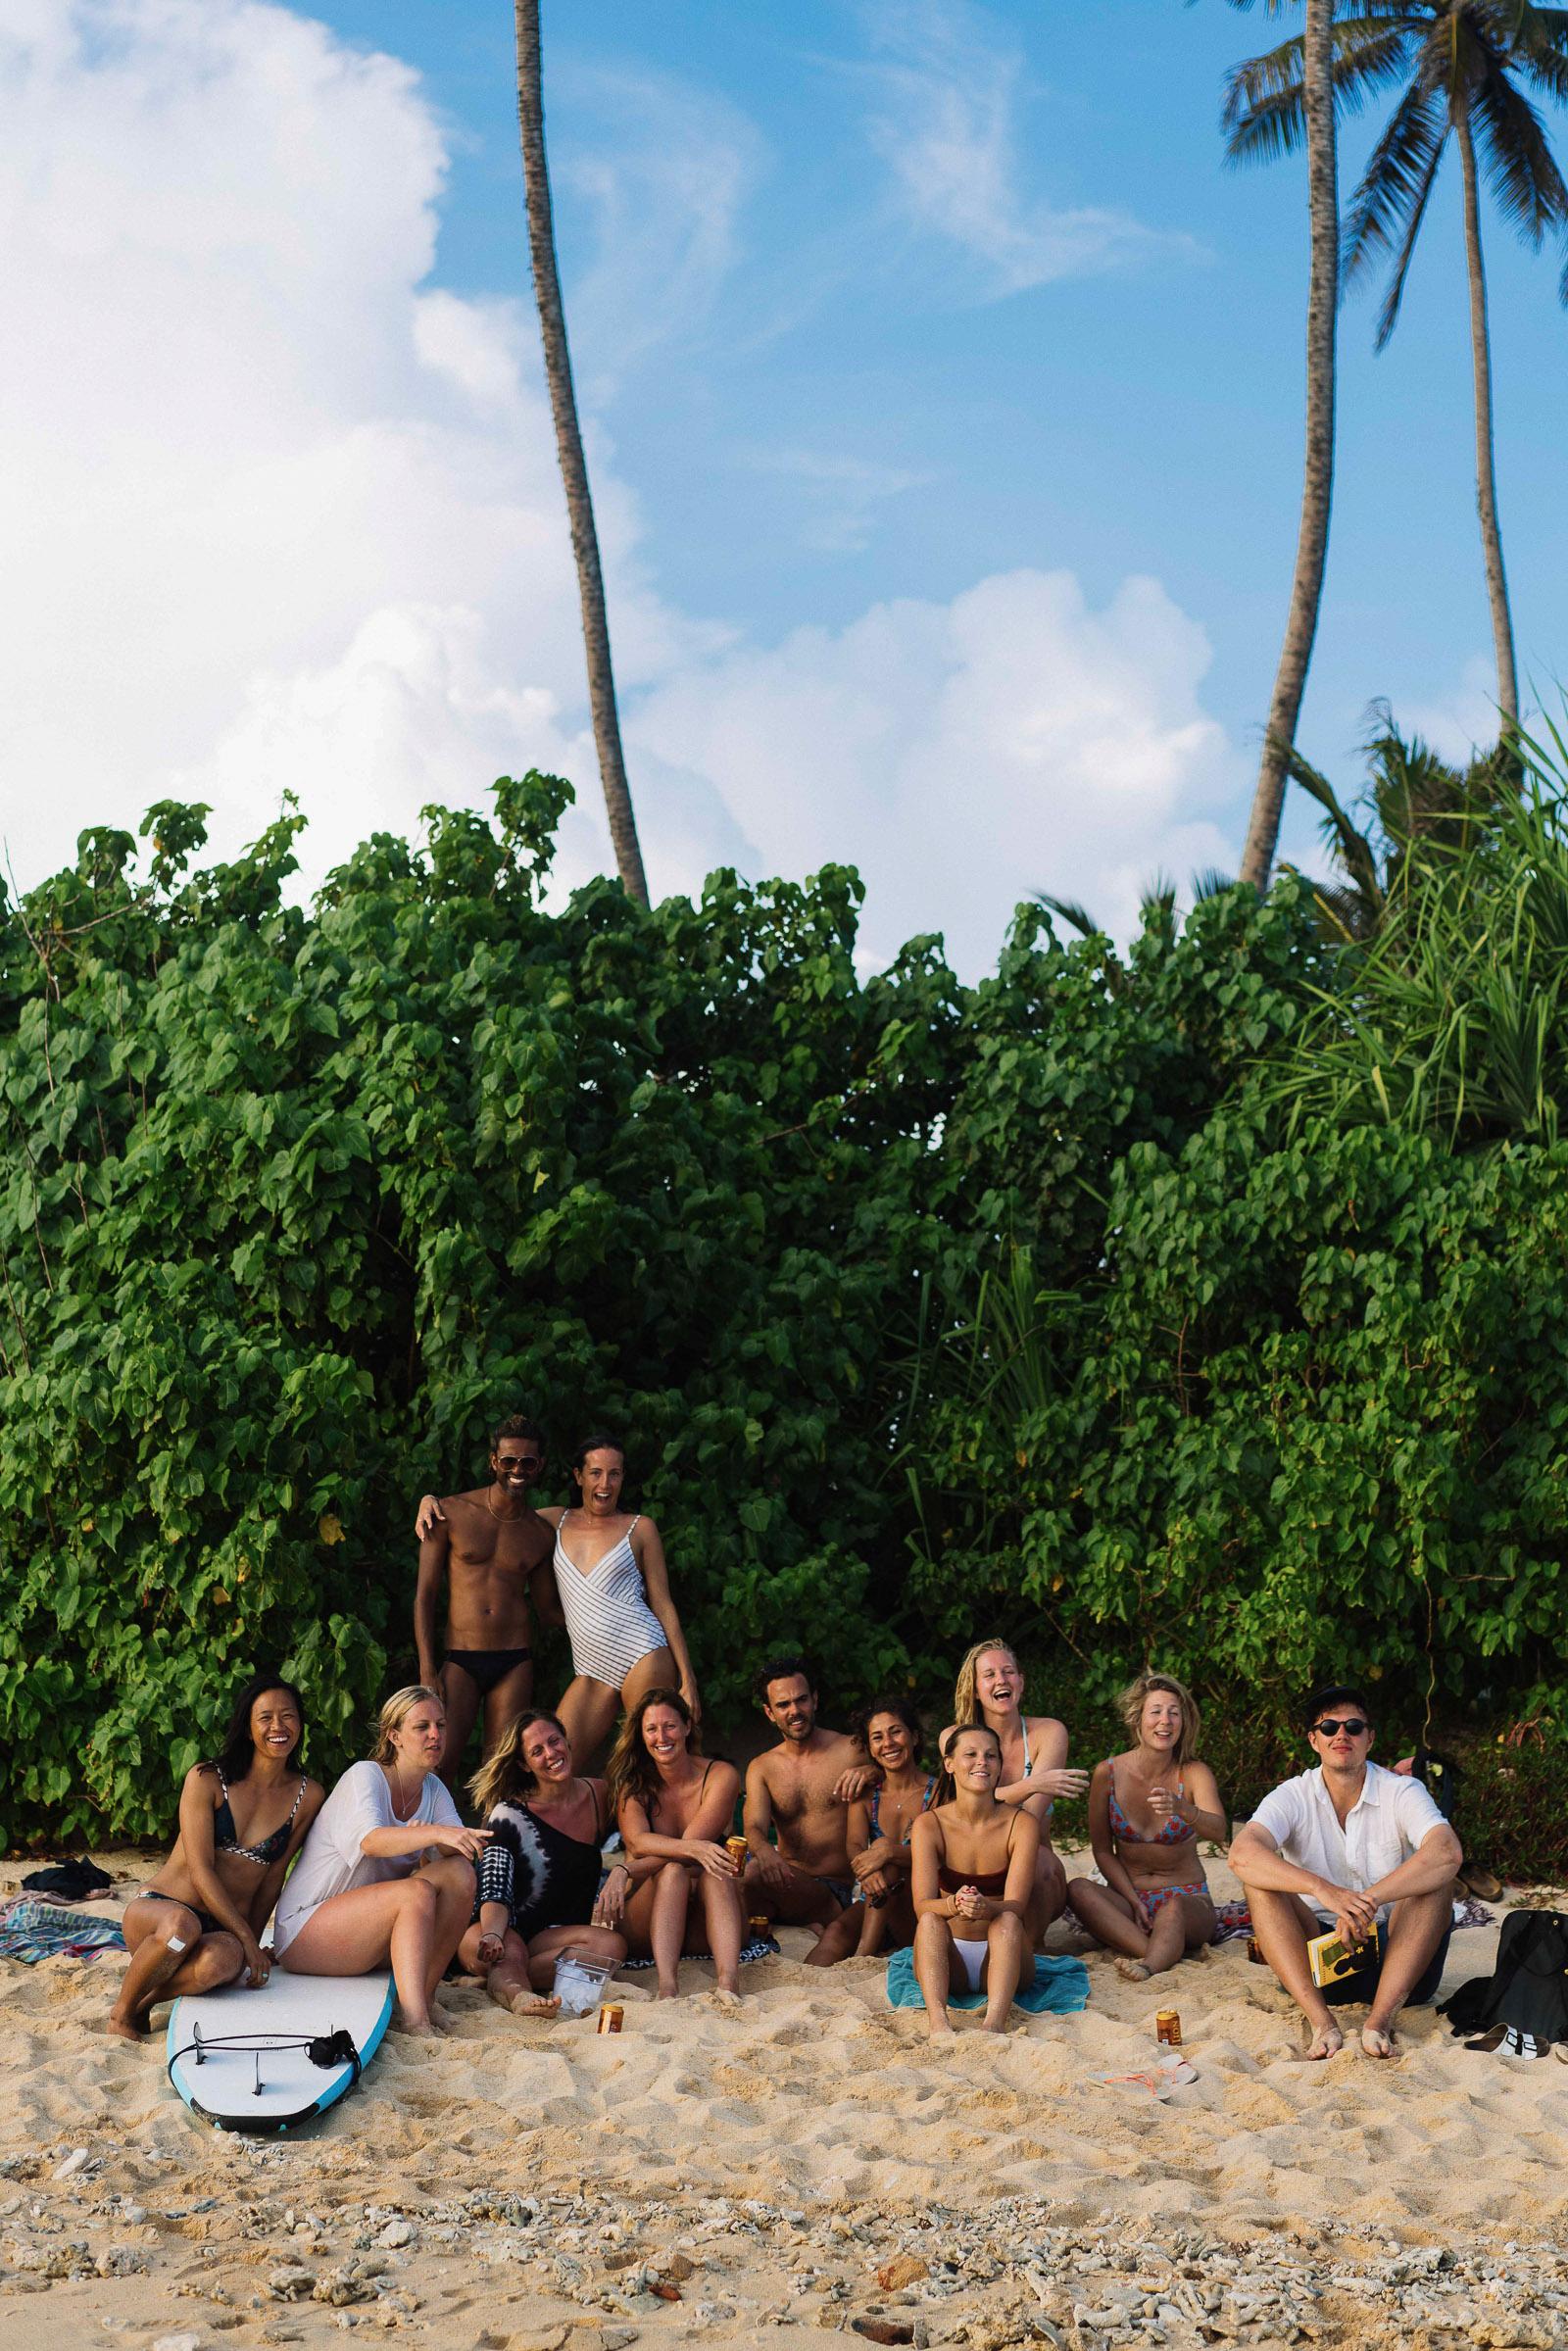 Sunshinestories-surf-travel-blog-4-5pm2